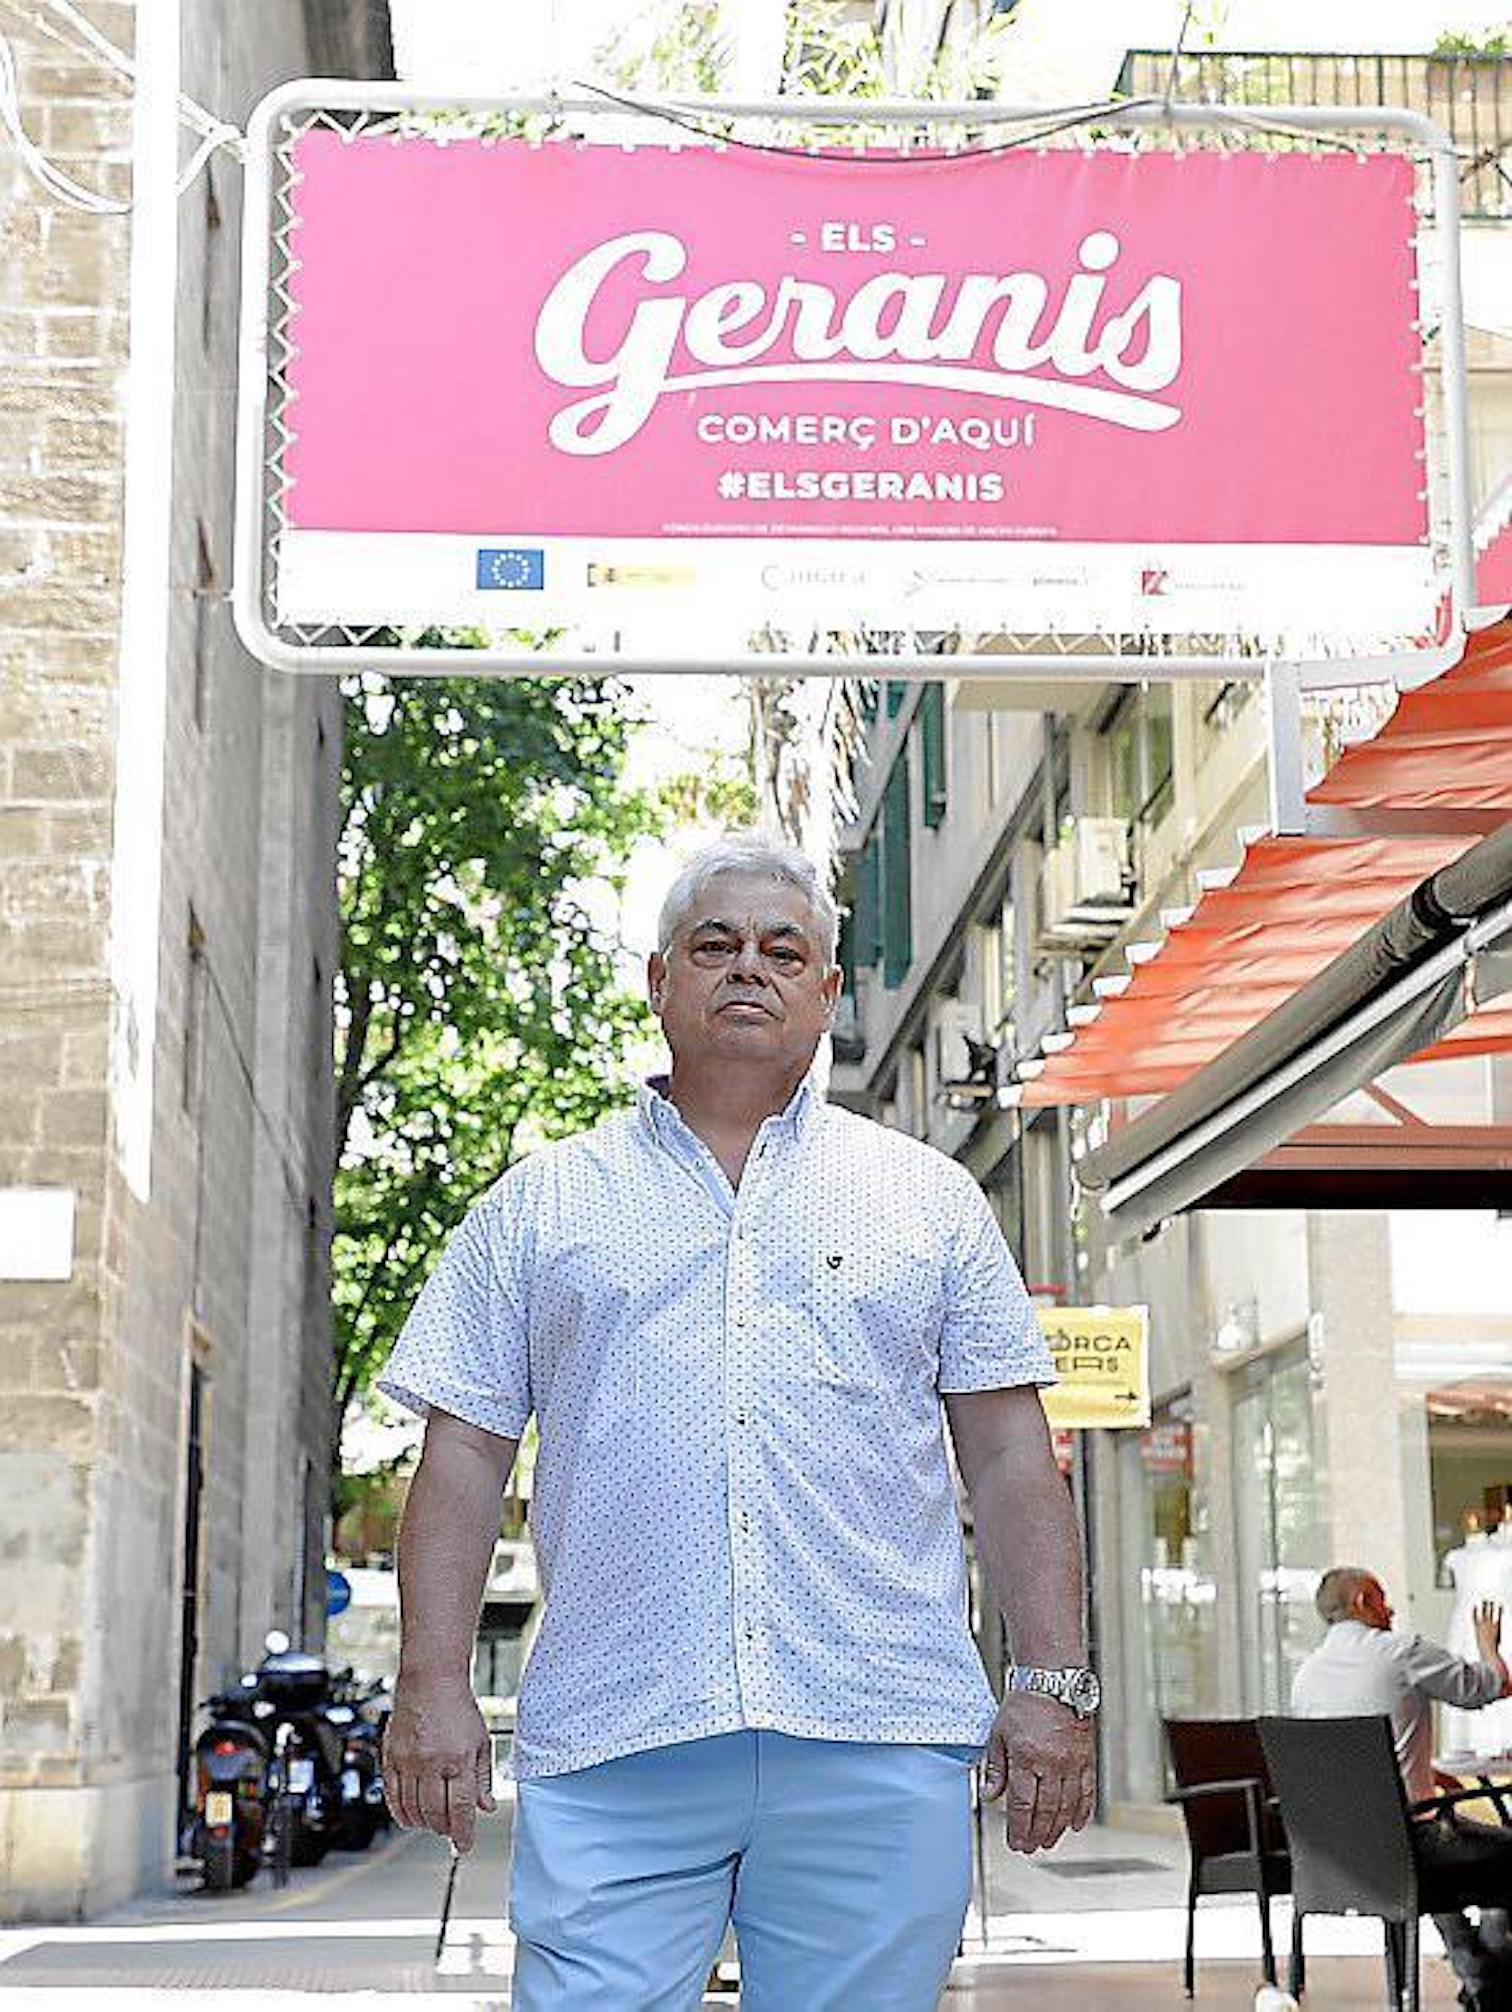 Mateu Cunill, President, Els Geranis Merchants Association, Balearic Confederation of Comerç & Owner of Pedro Lladó Tailoring